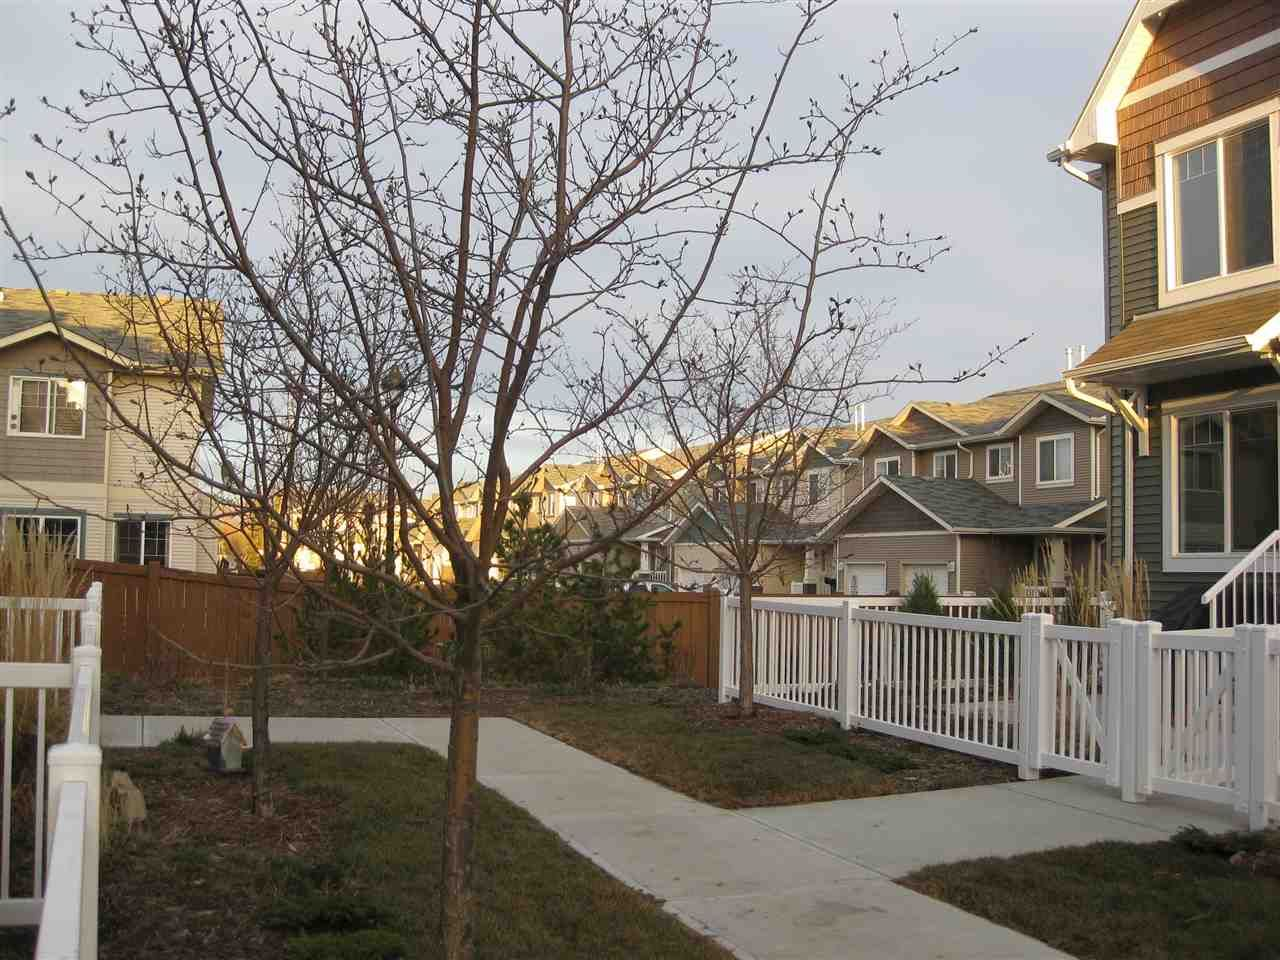 Photo 25: Photos: #41 3625 144 AV NW in Edmonton: Zone 35 Townhouse for sale : MLS®# E4016087